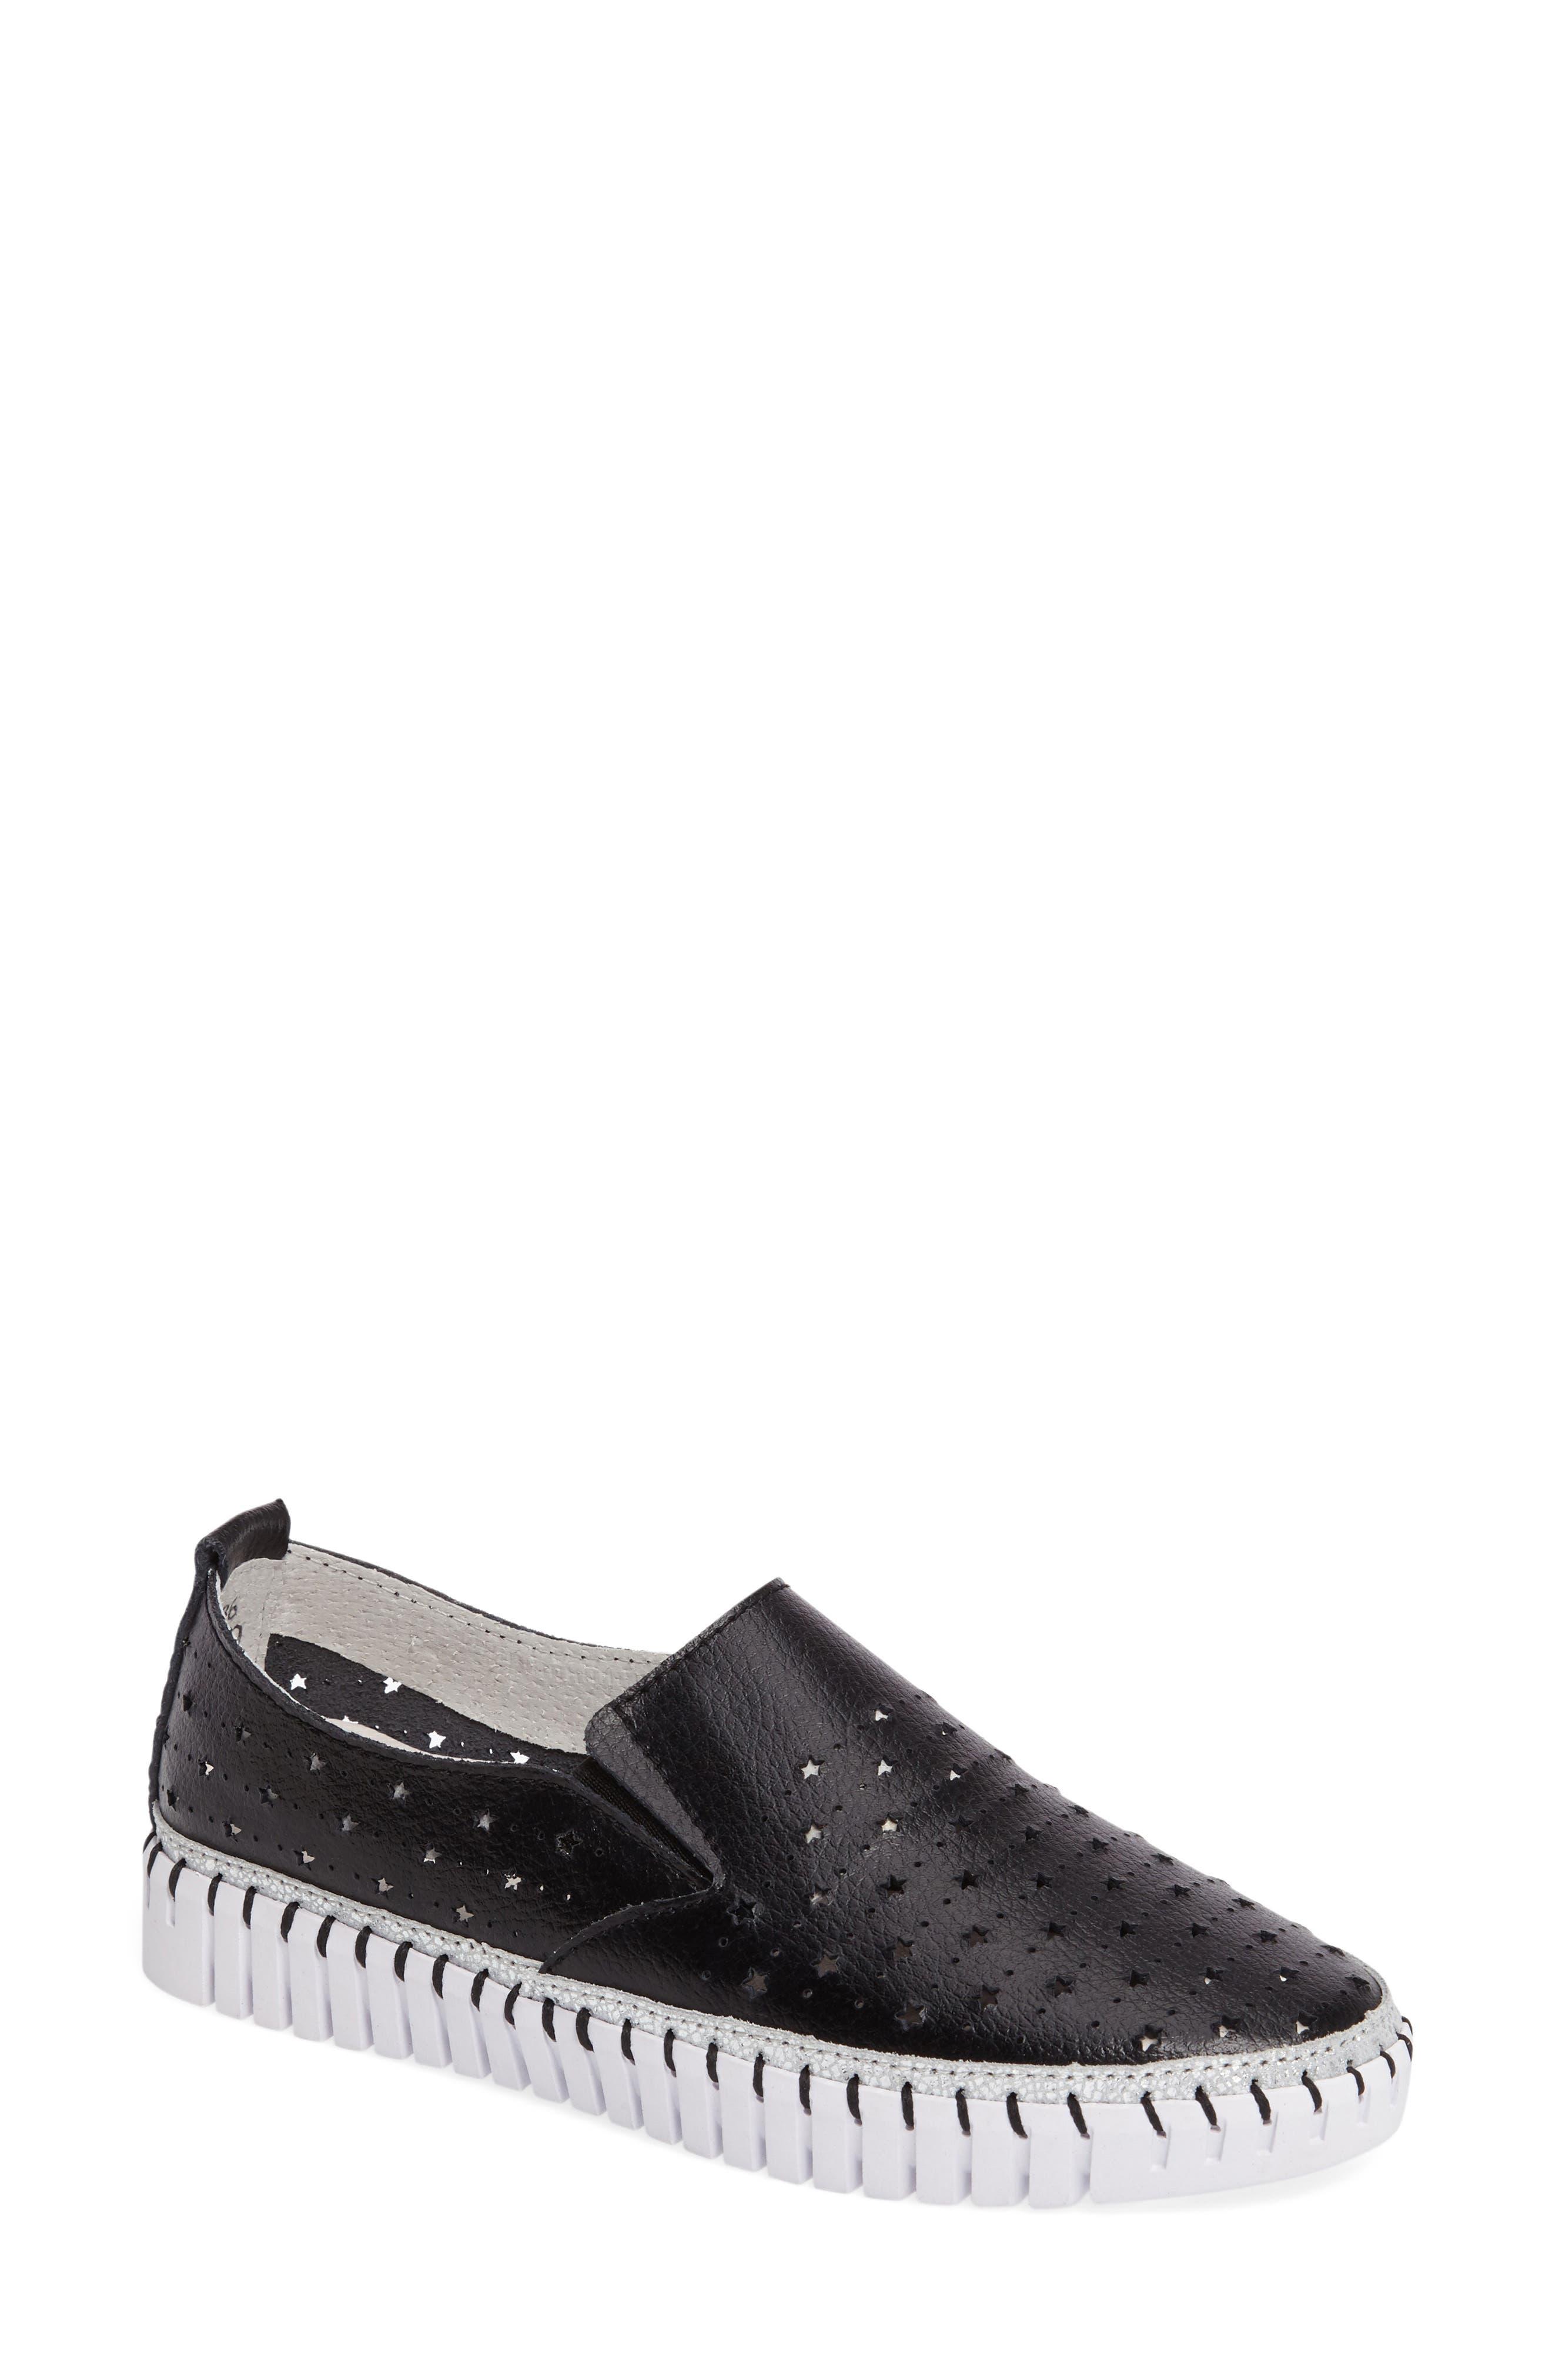 TW40 Slip-On Sneaker,                             Main thumbnail 1, color,                             BLACK LEATHER